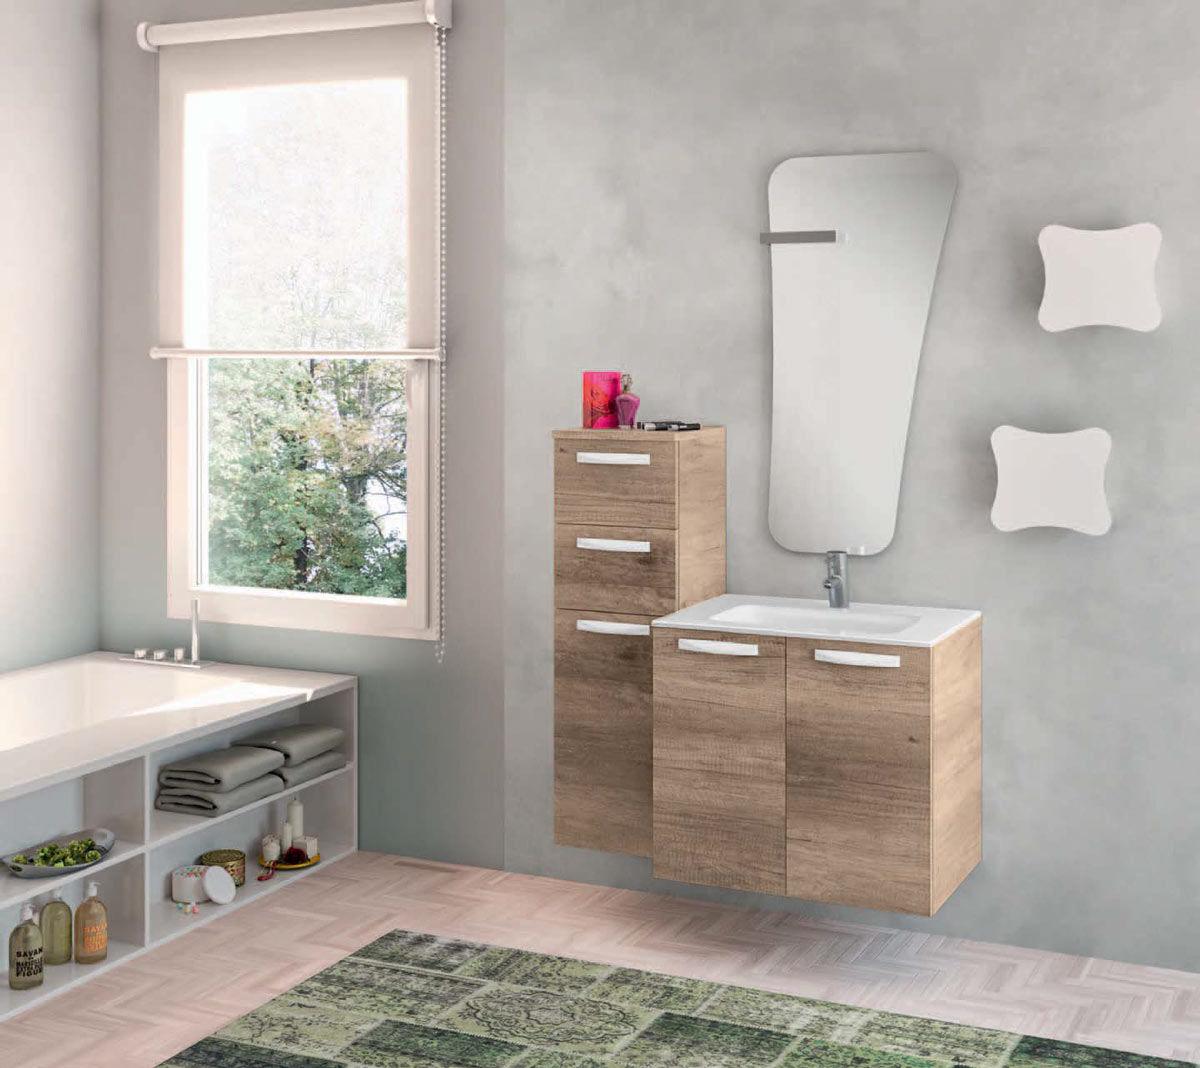 Arredi bagni classici top bagni classici arredamento arredo bagno classico img l foto mobile - Arredo bagno classico elegante prezzi ...